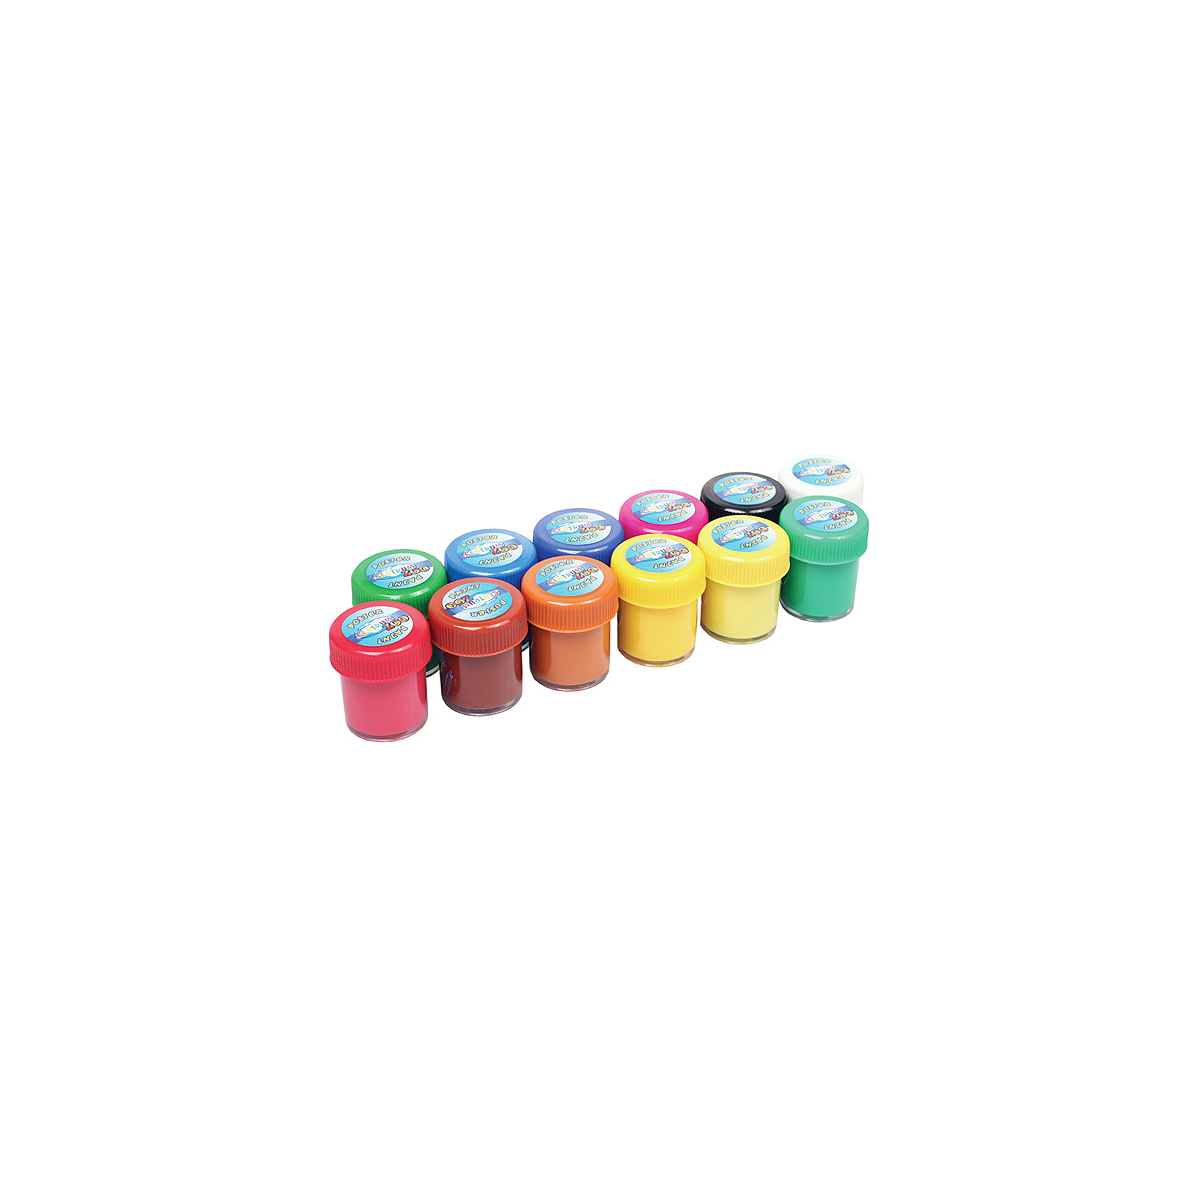 Guașe, 12 Culori, 20 Mililitri, Model Zoo, Centrum, 82561